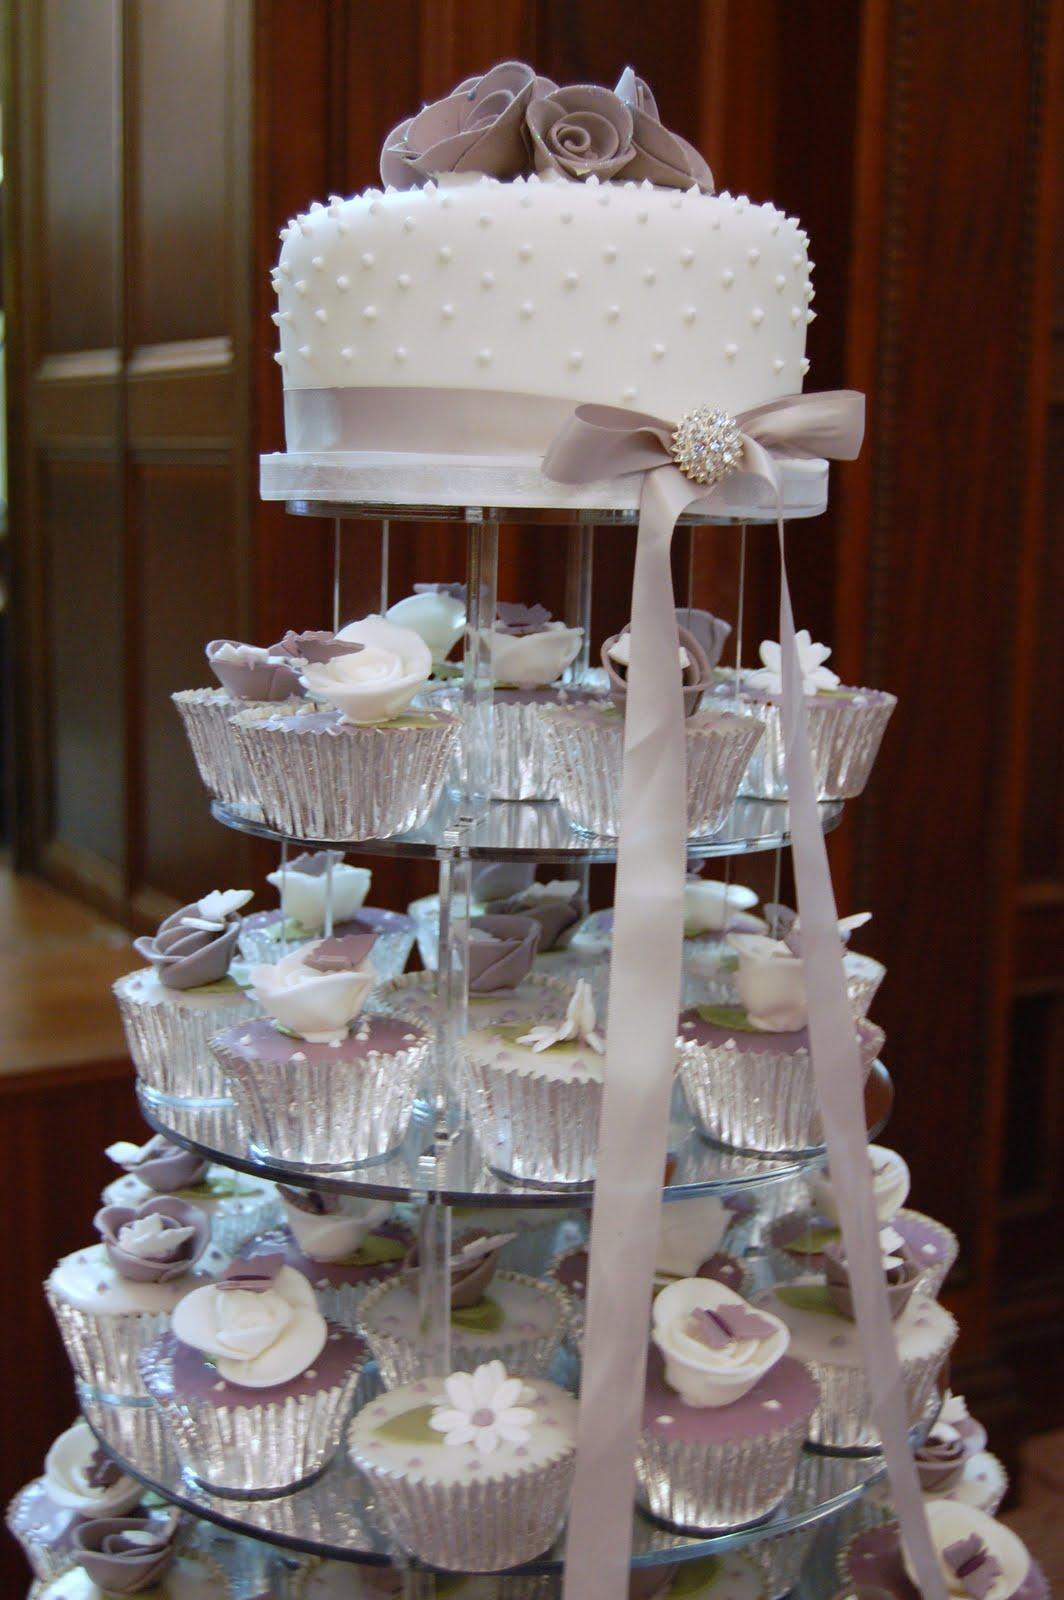 Iced Victorian Lilac Cupcake Wedding Cake